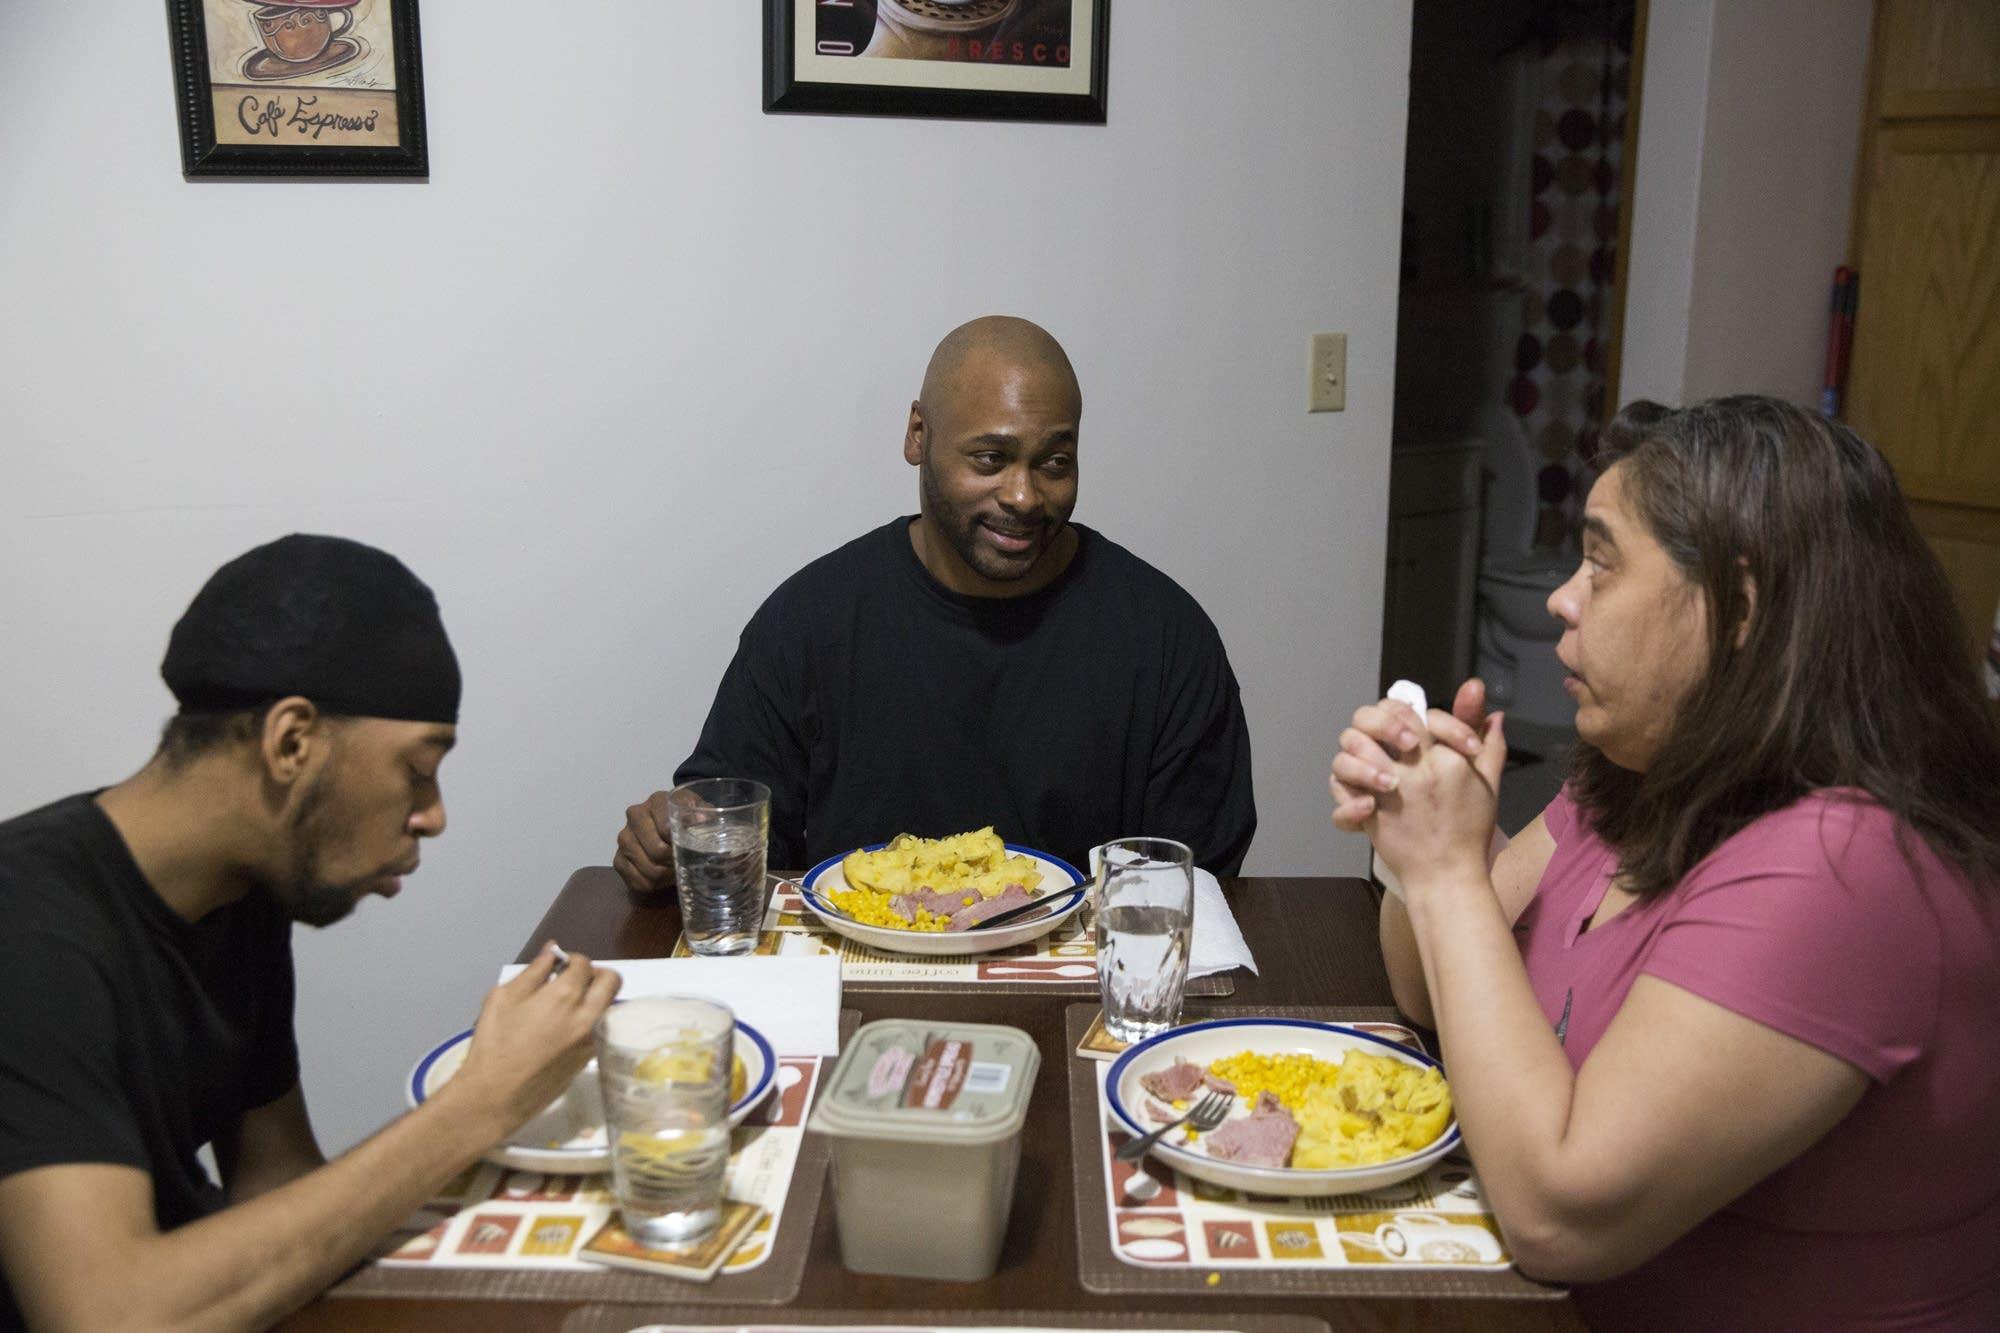 Adoniyah Israel eats dinner with his wife, Aviyah.